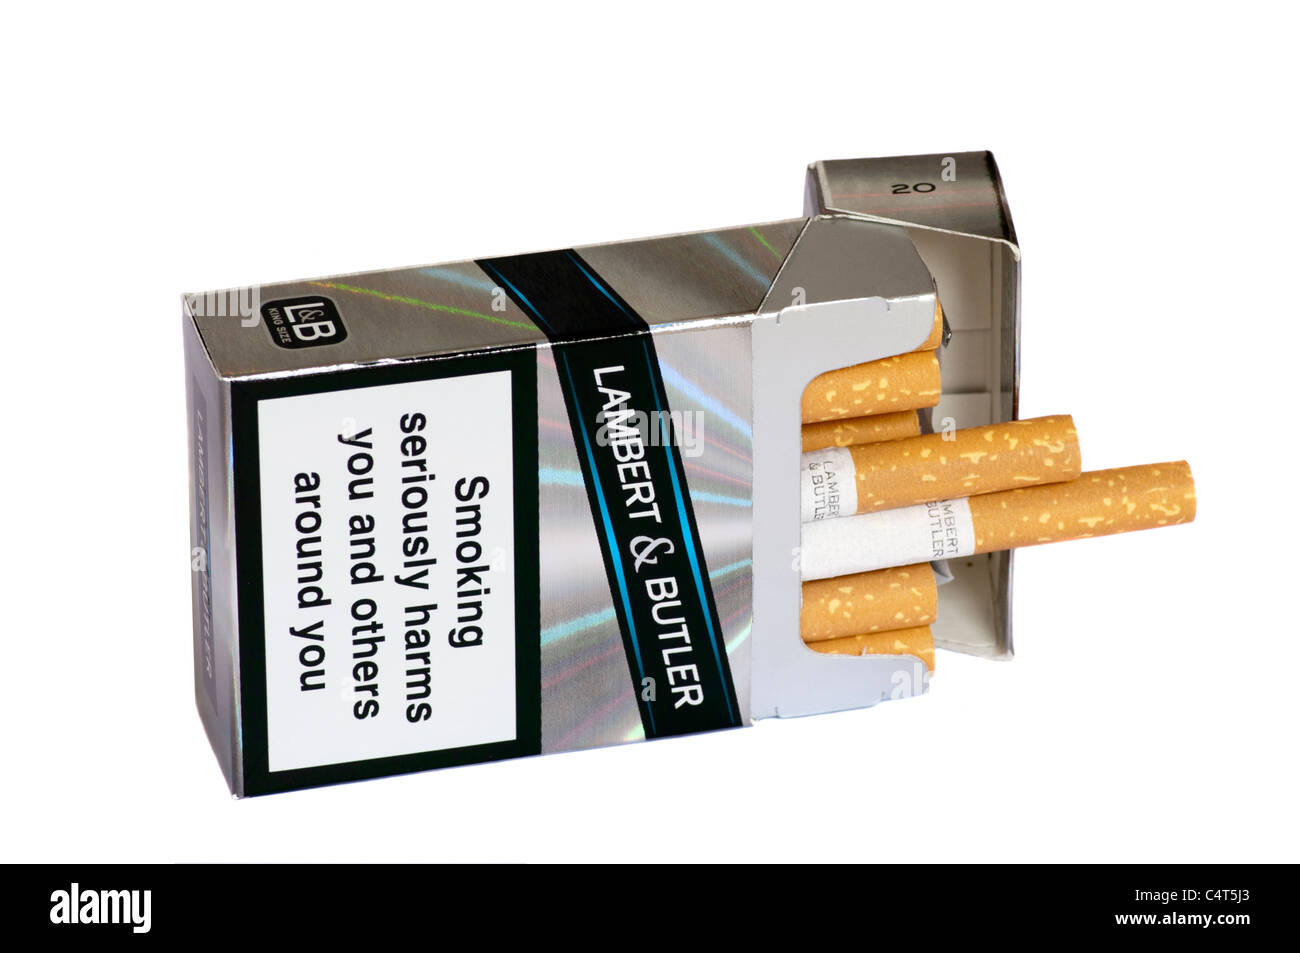 Packs of cigarettes Marlboro per day